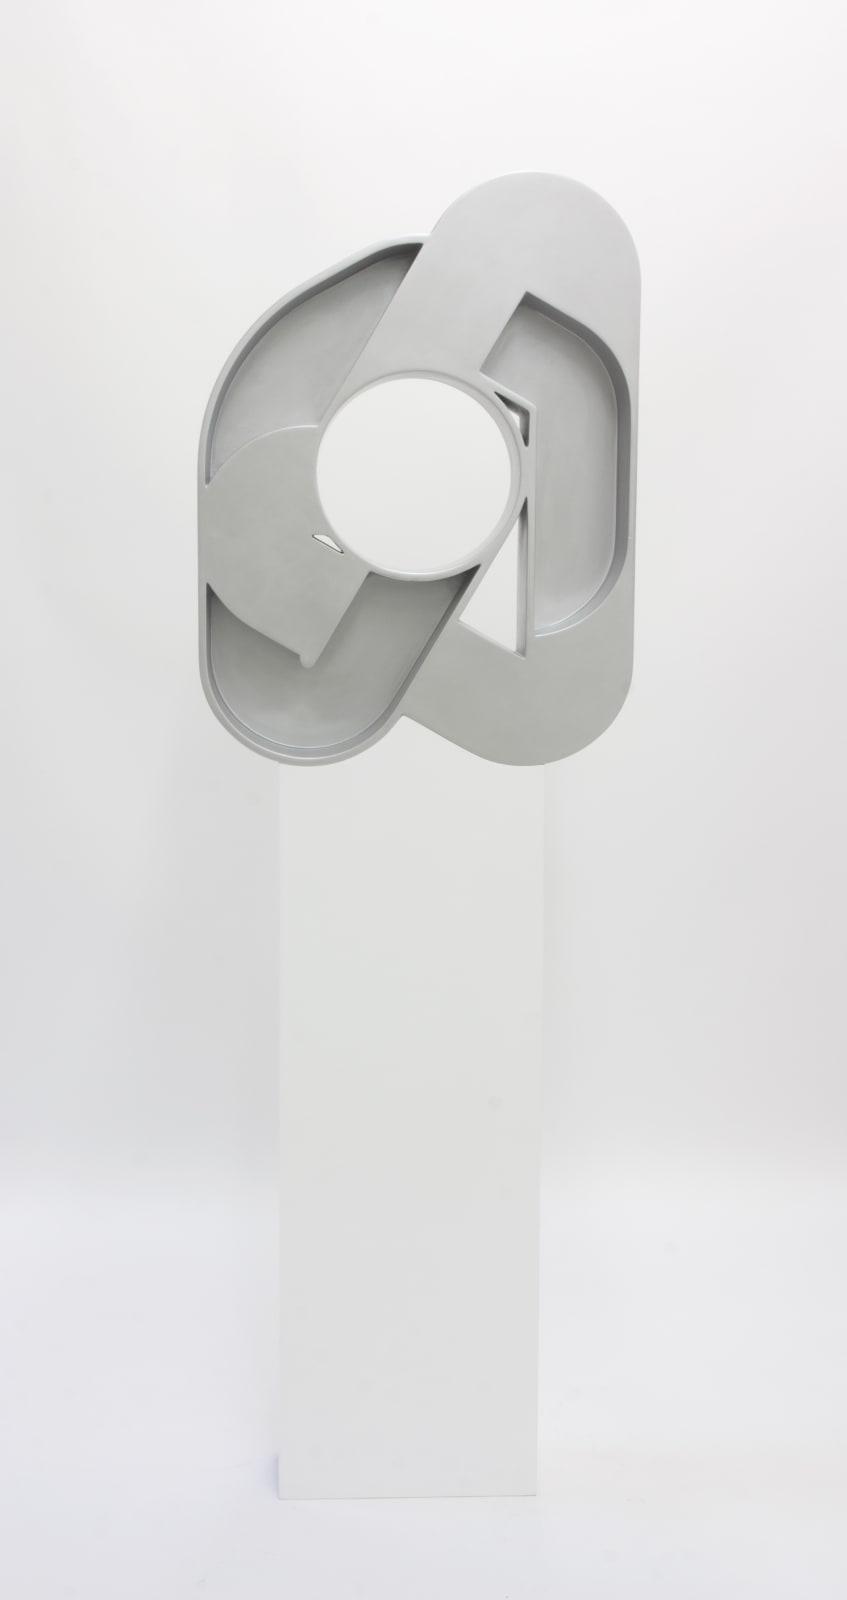 Amir Nikravan, Centrifuge, 2020